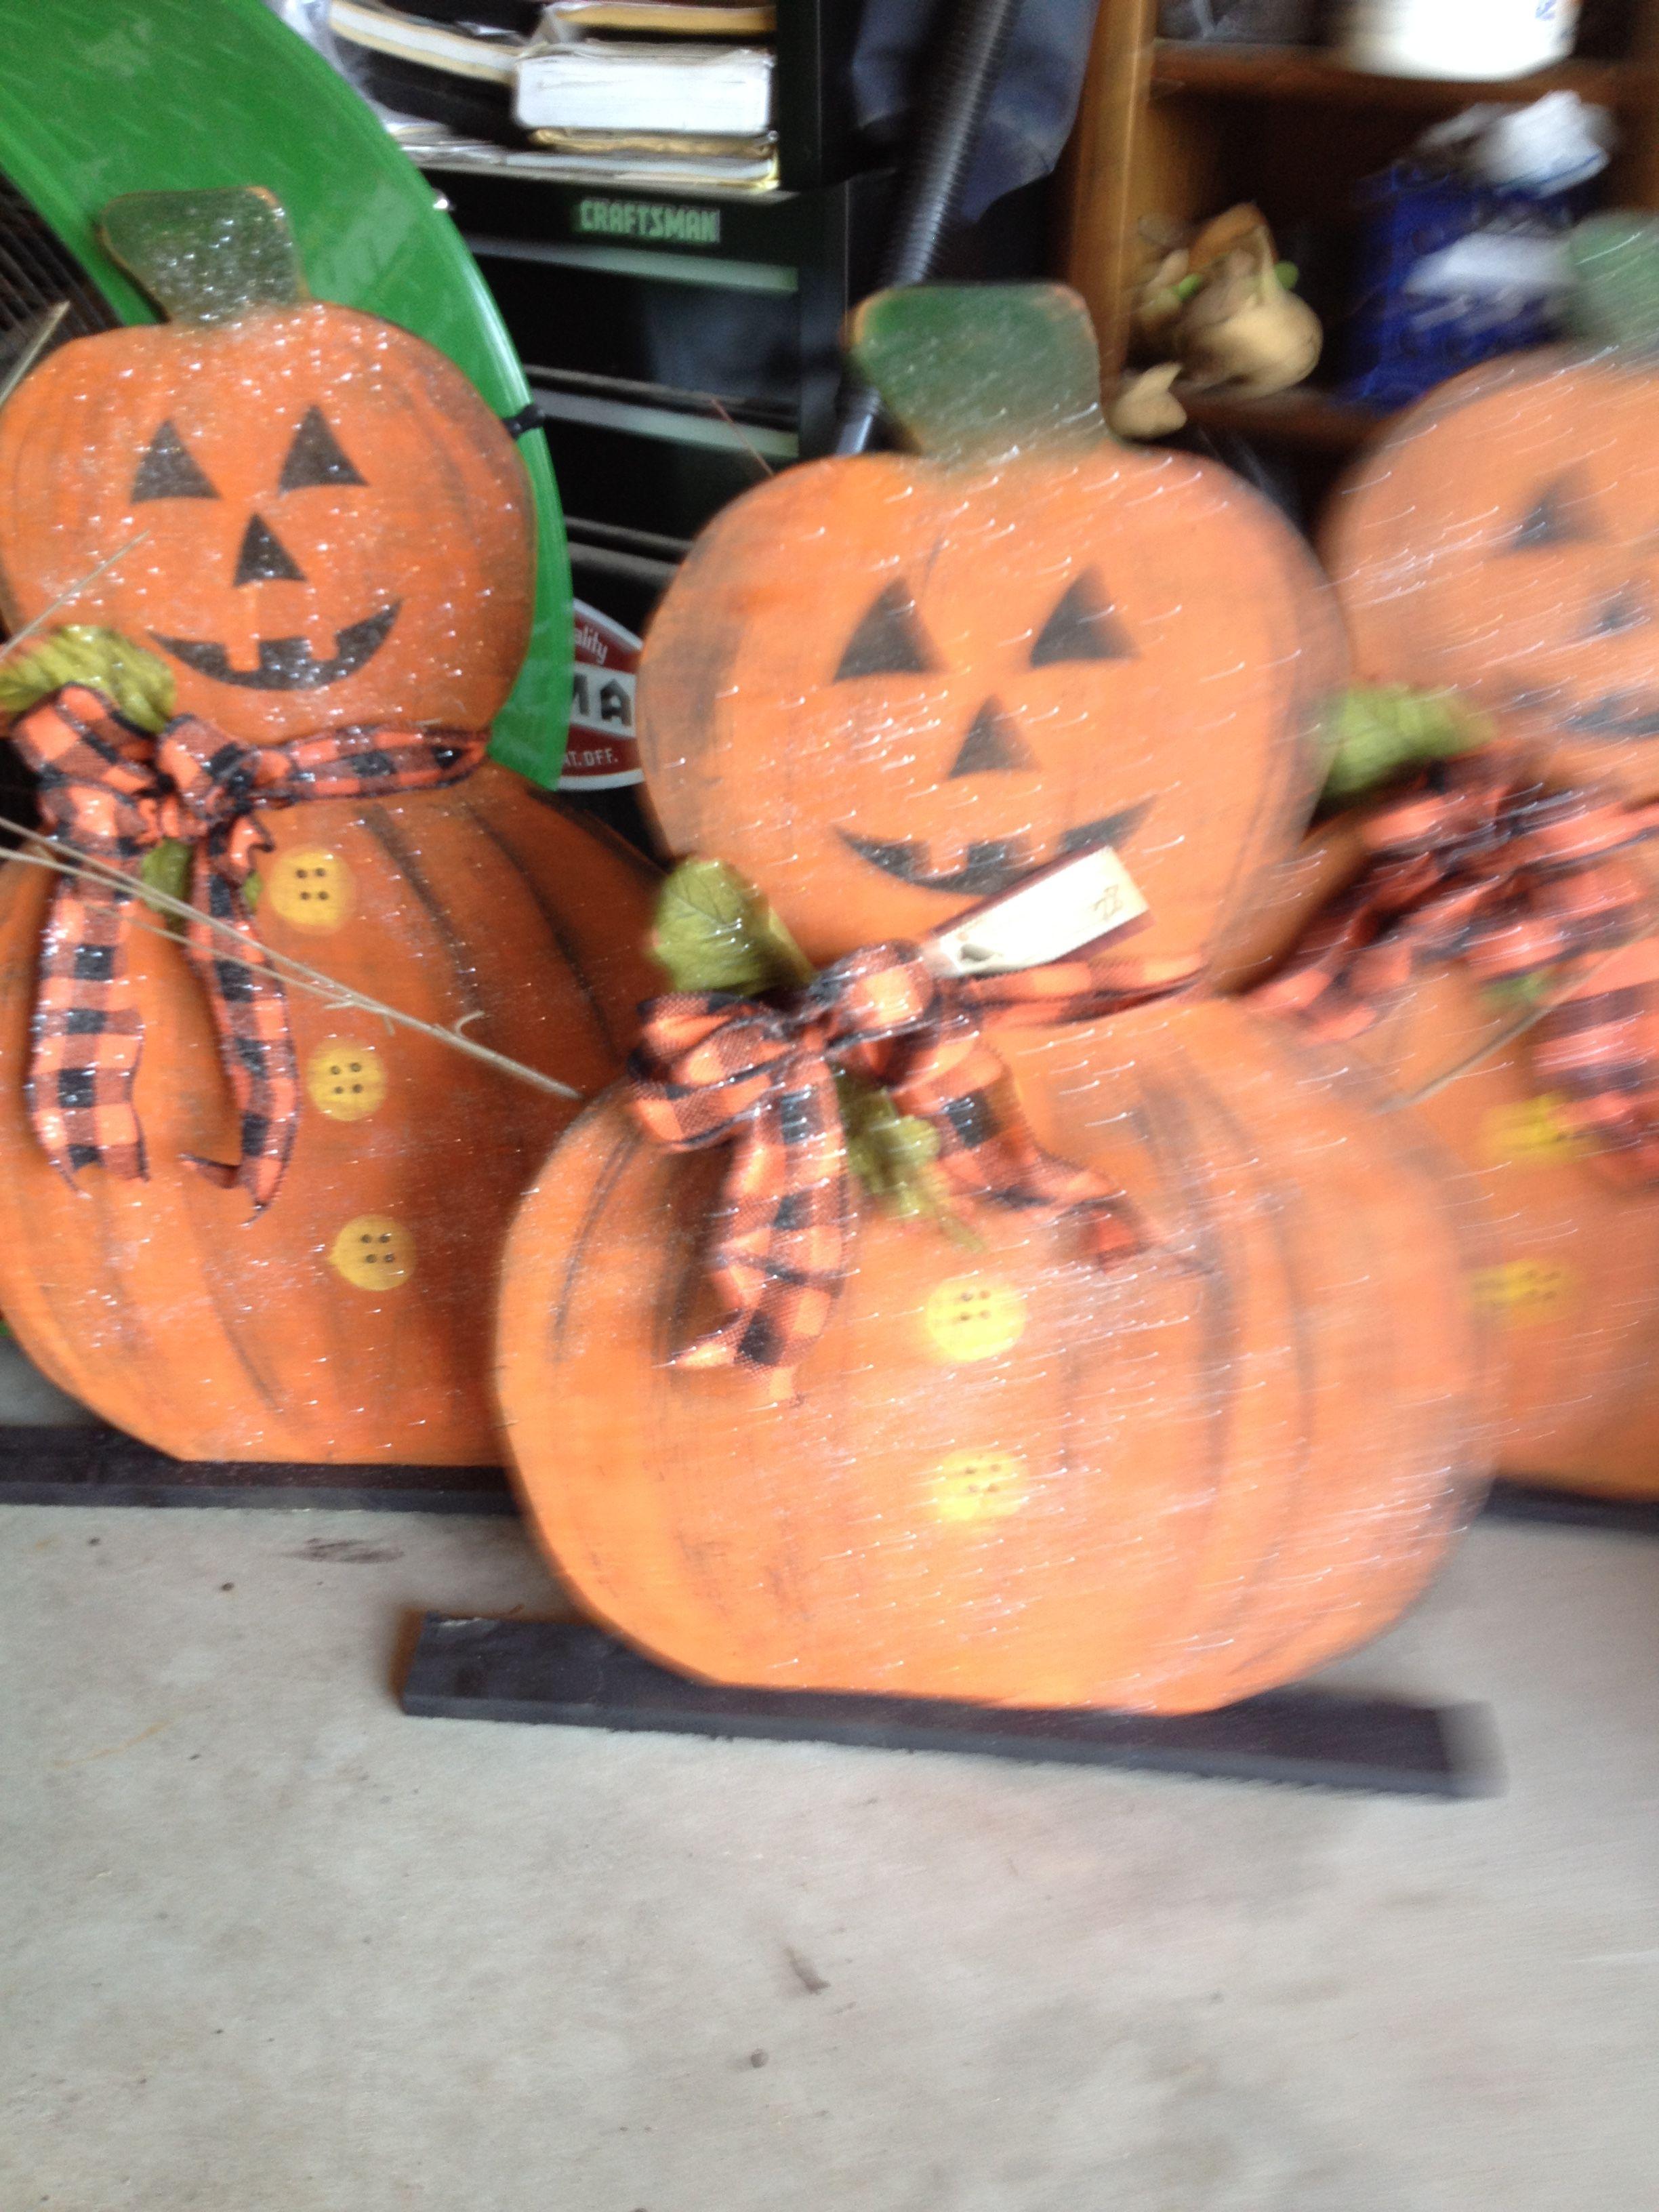 Jack O Lantern | Fall crafts, Fall wood crafts, Crafts